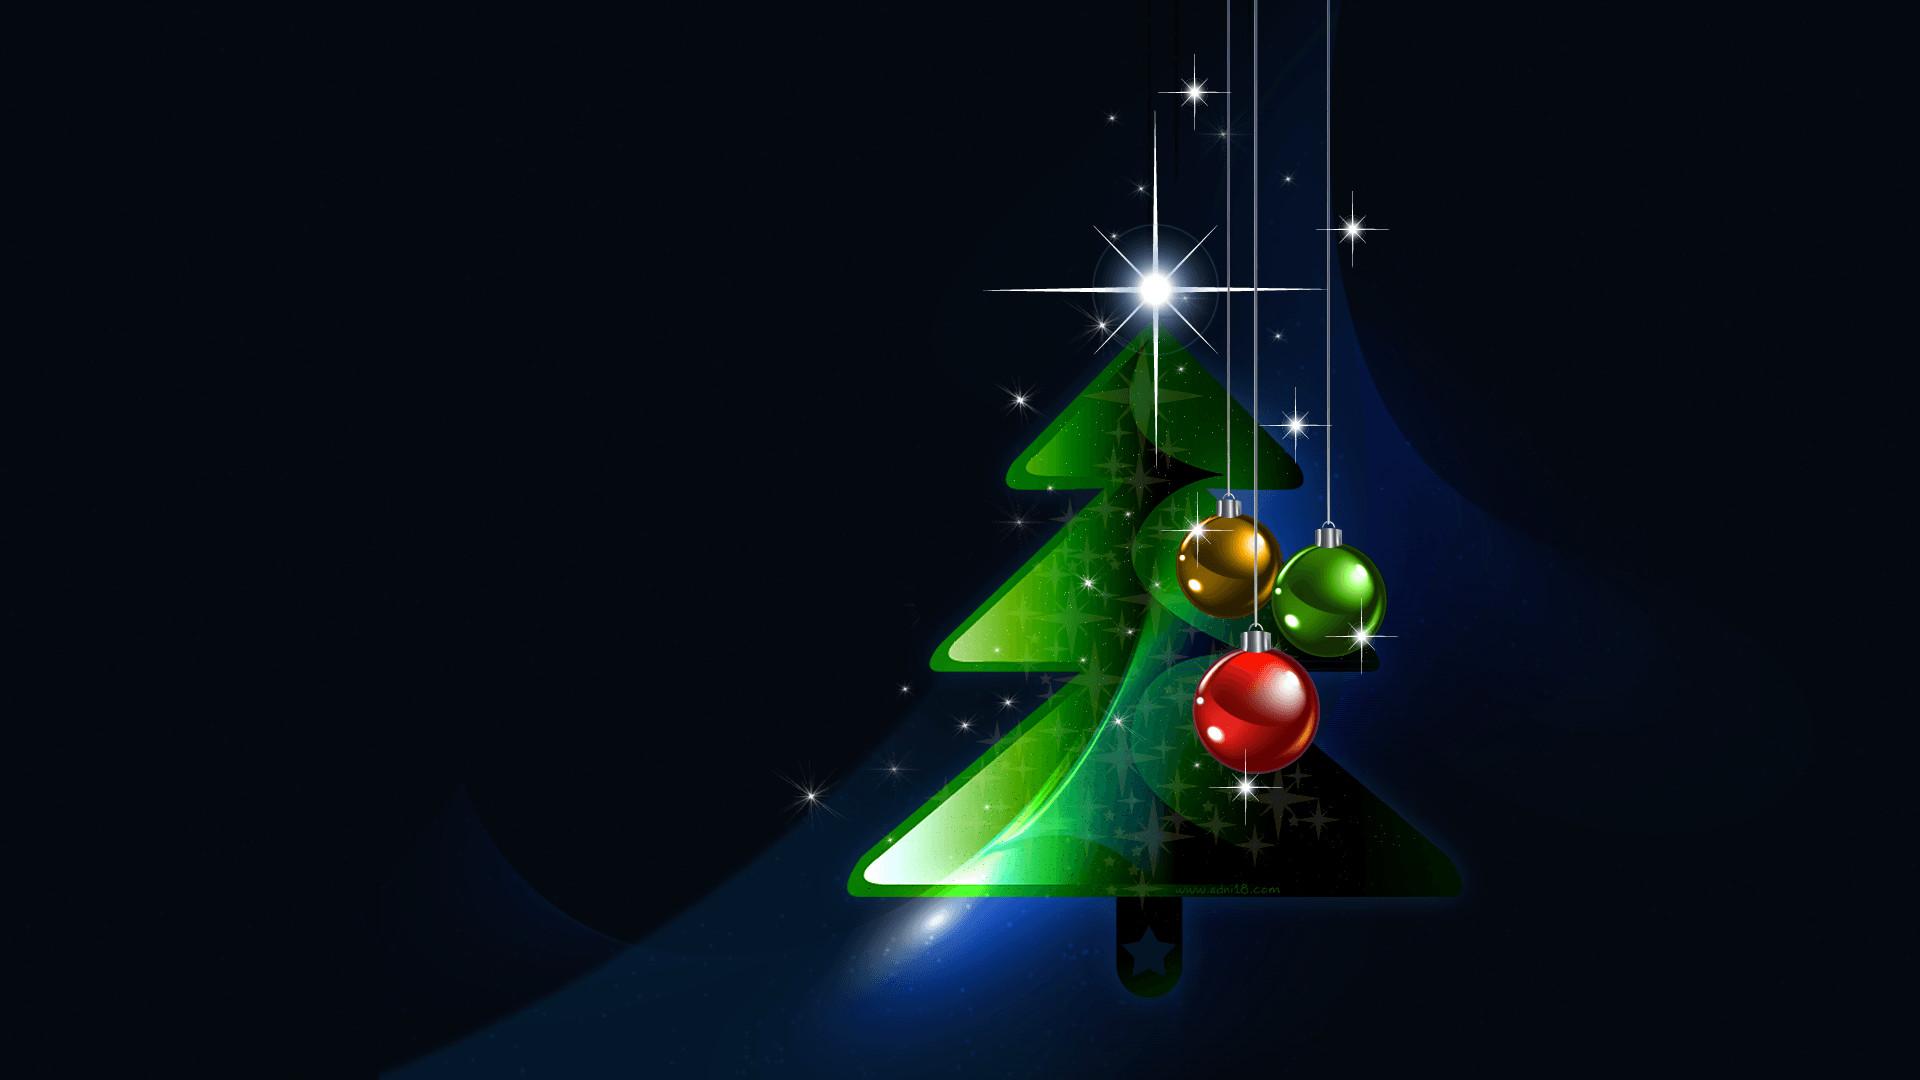 Christmas HD Widescreen Wallpaper – WallpaperSafari